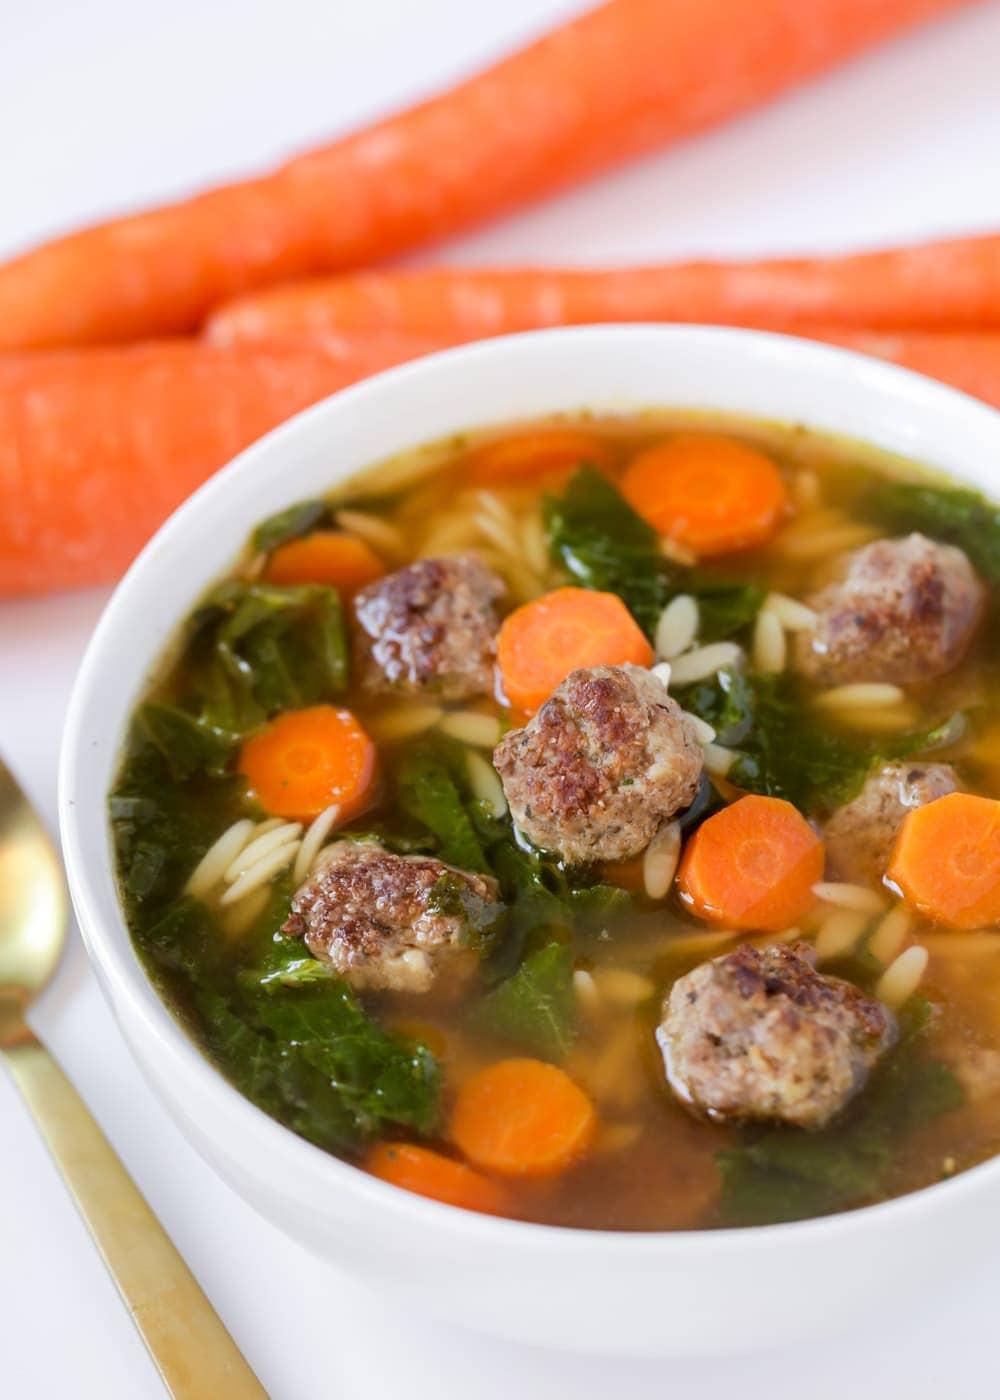 Italian wedding soup recipe close up image